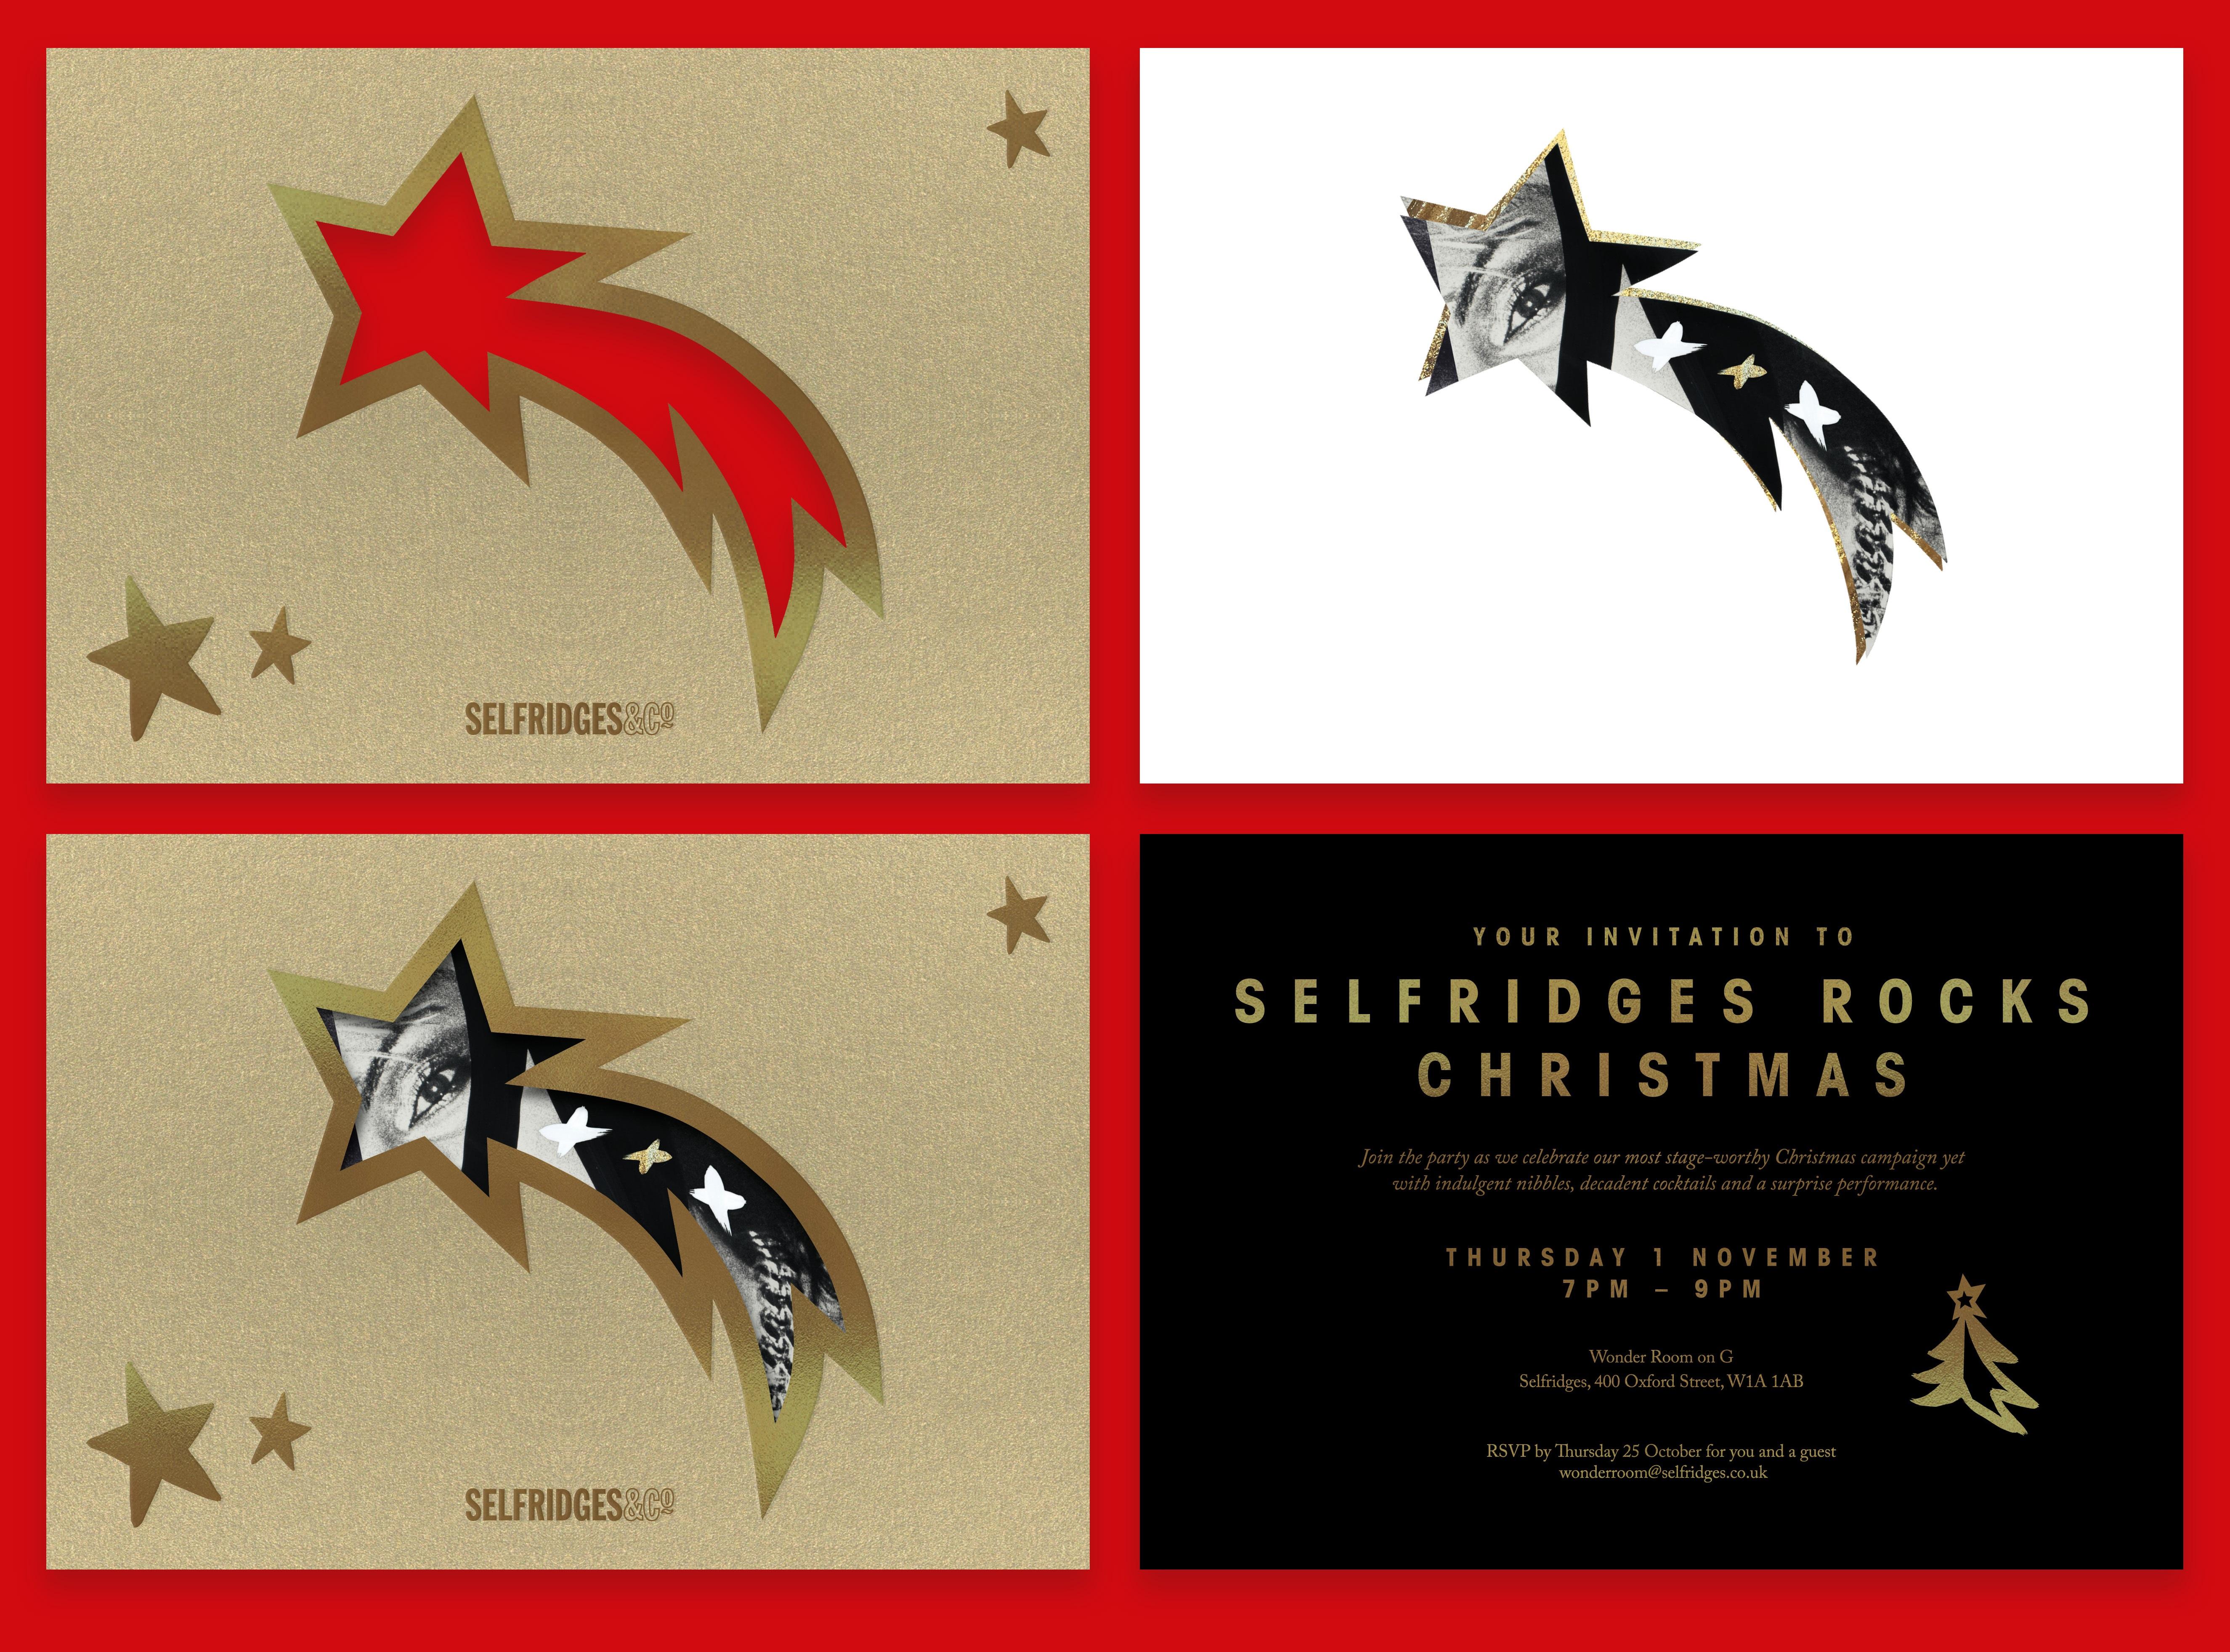 Selfridges_Composite_NoStrapline